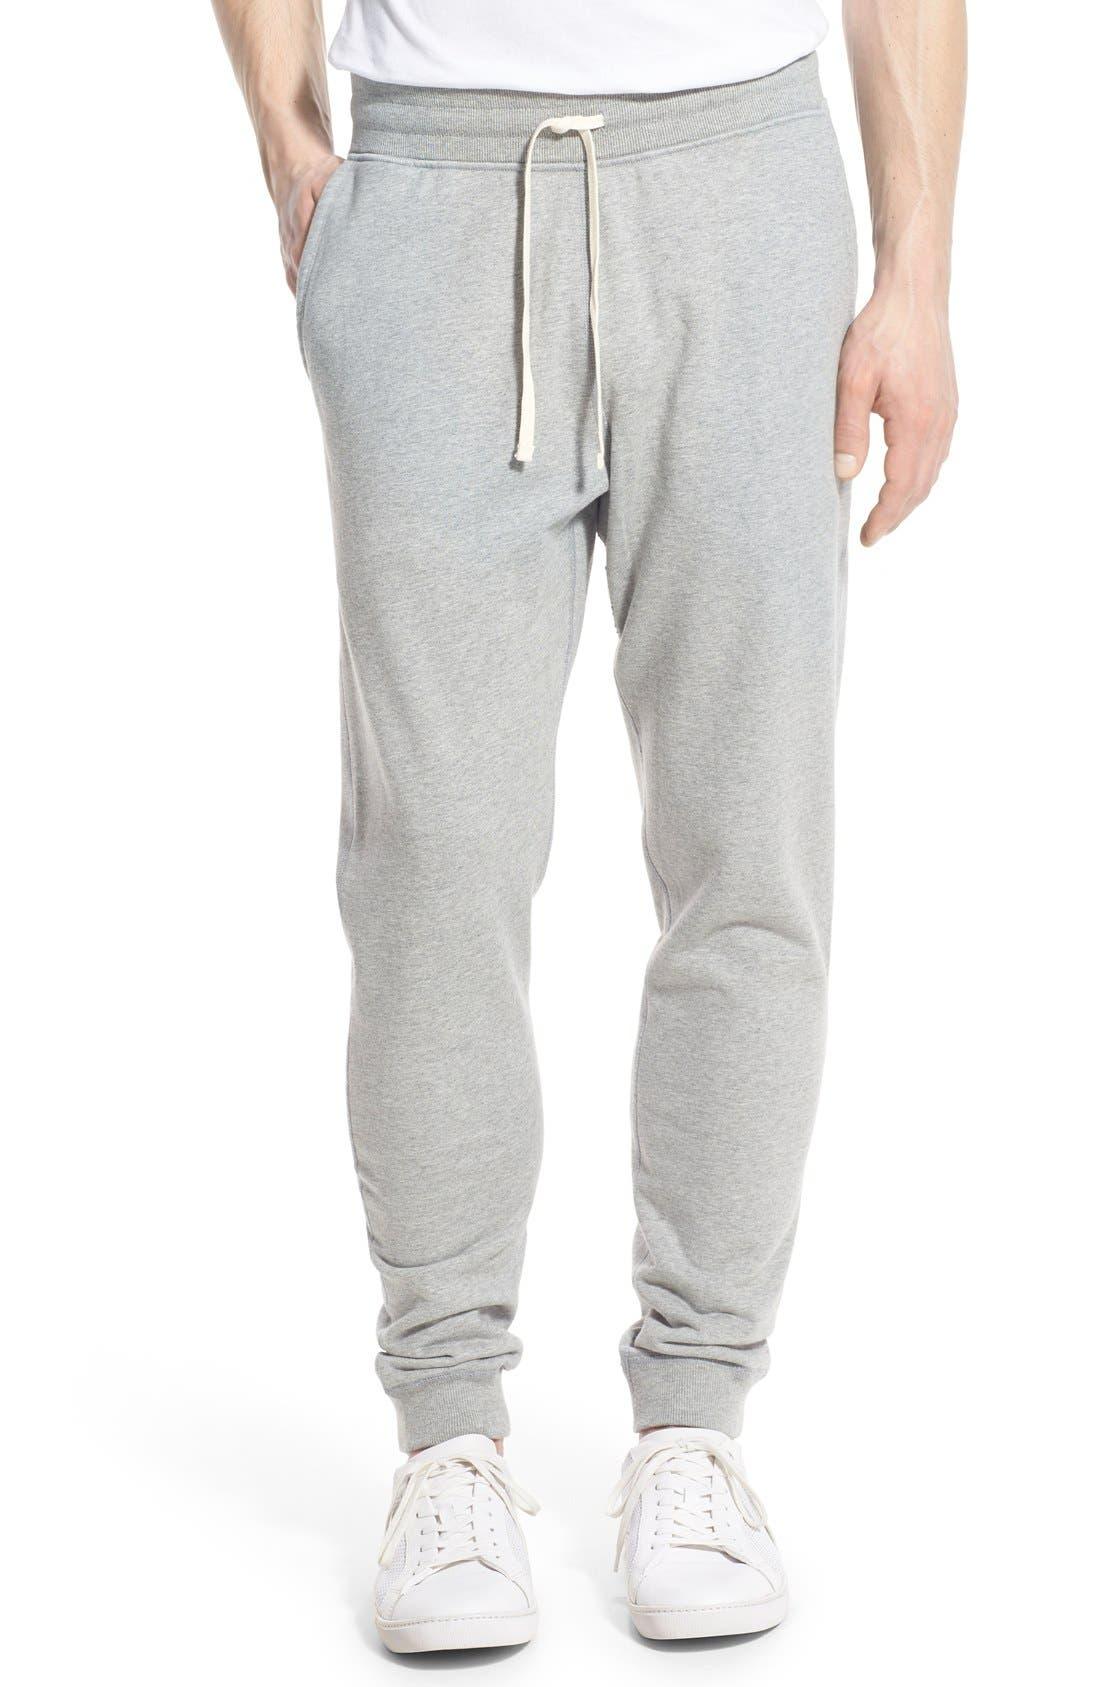 REIGNING CHAMP Slim Fit Sweatpants